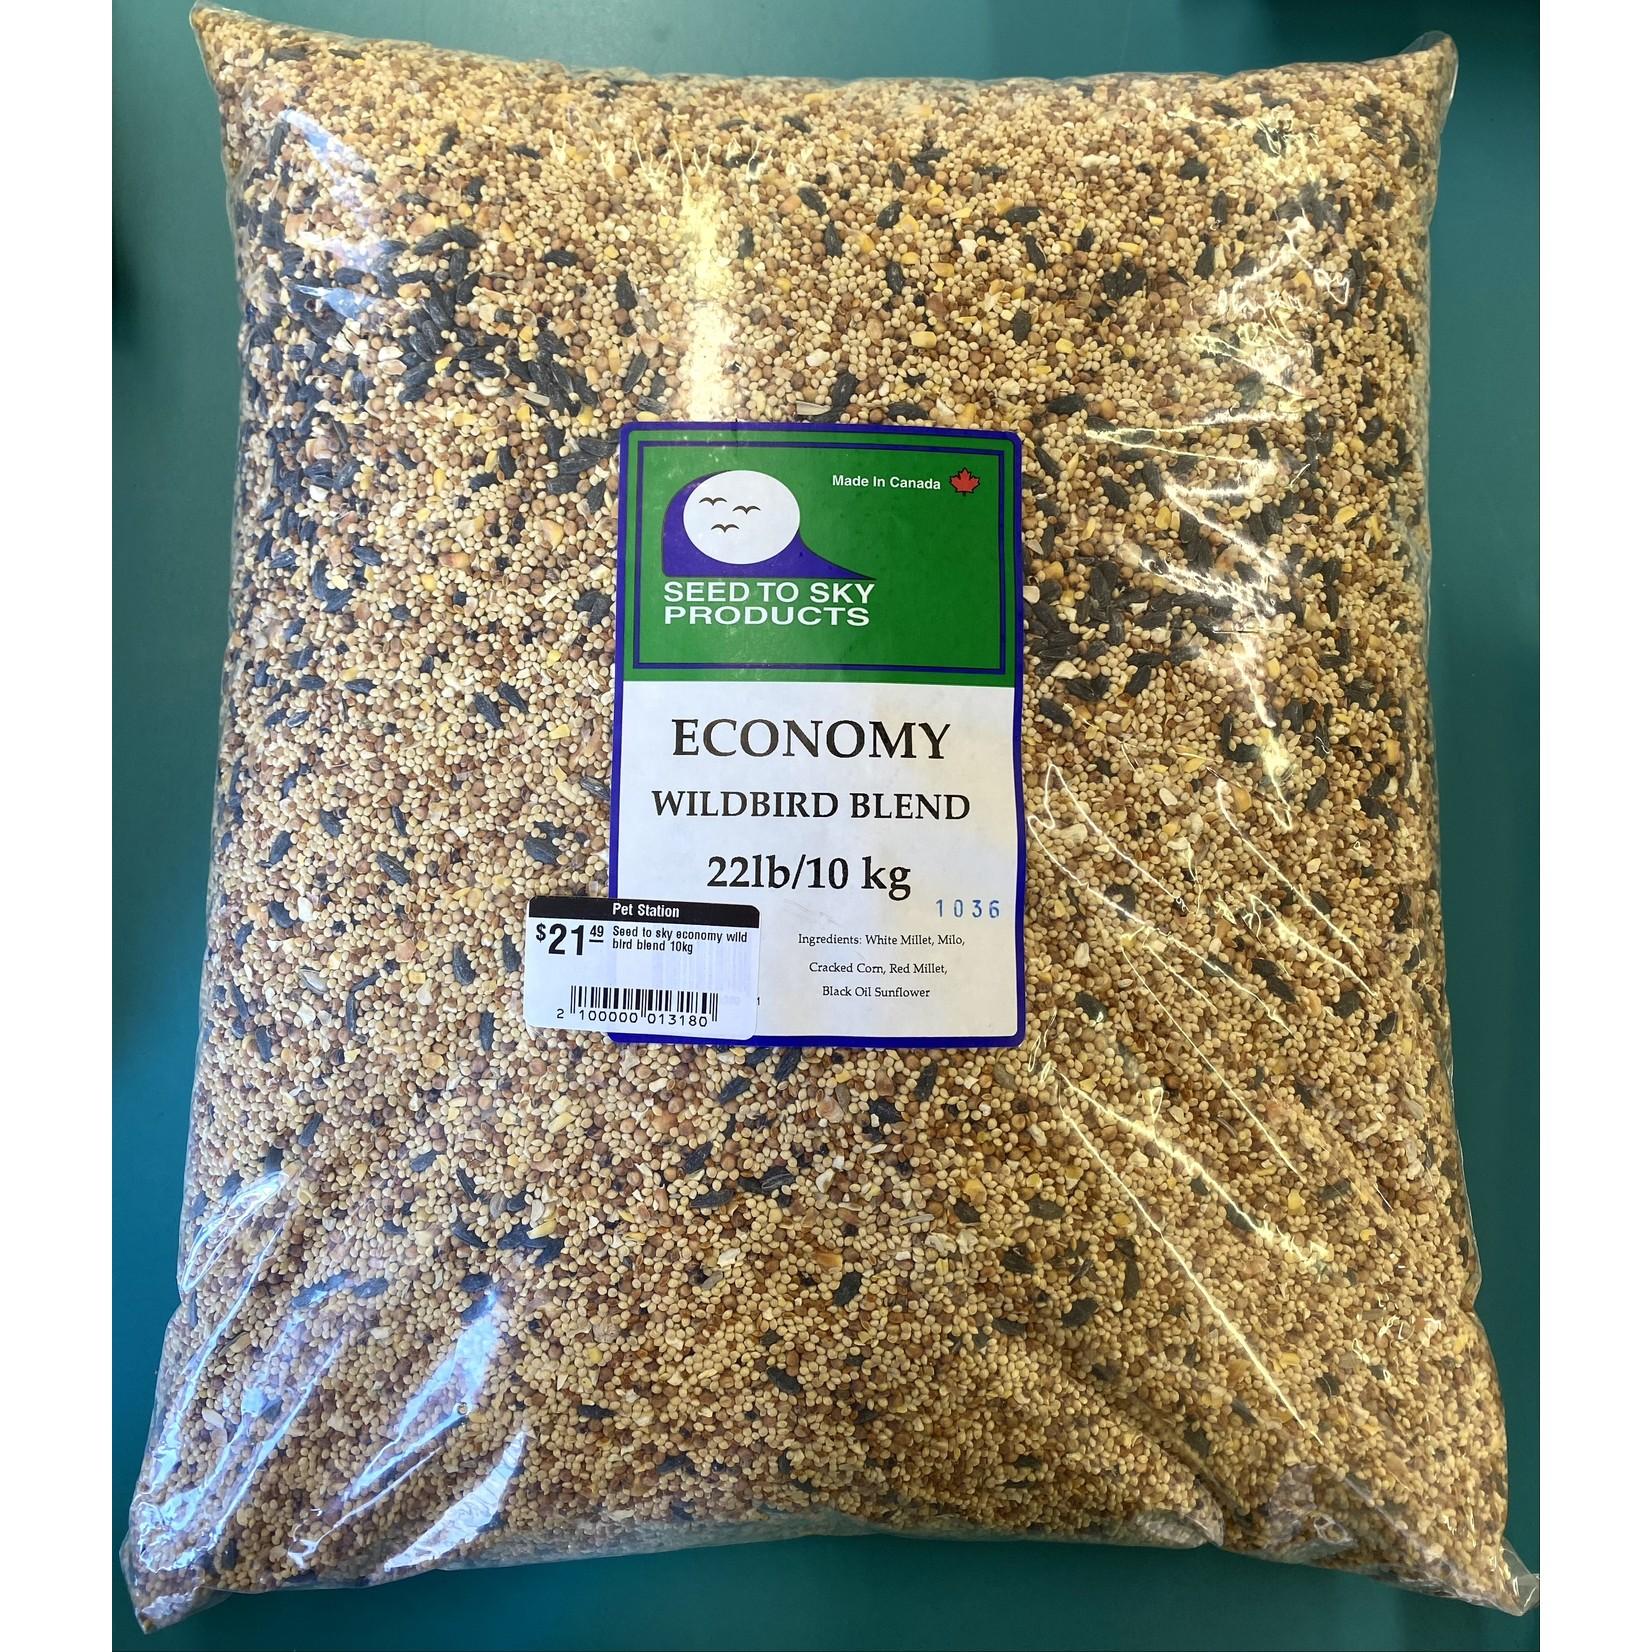 seed to sky Seed to sky economy wild bird blend 10kg